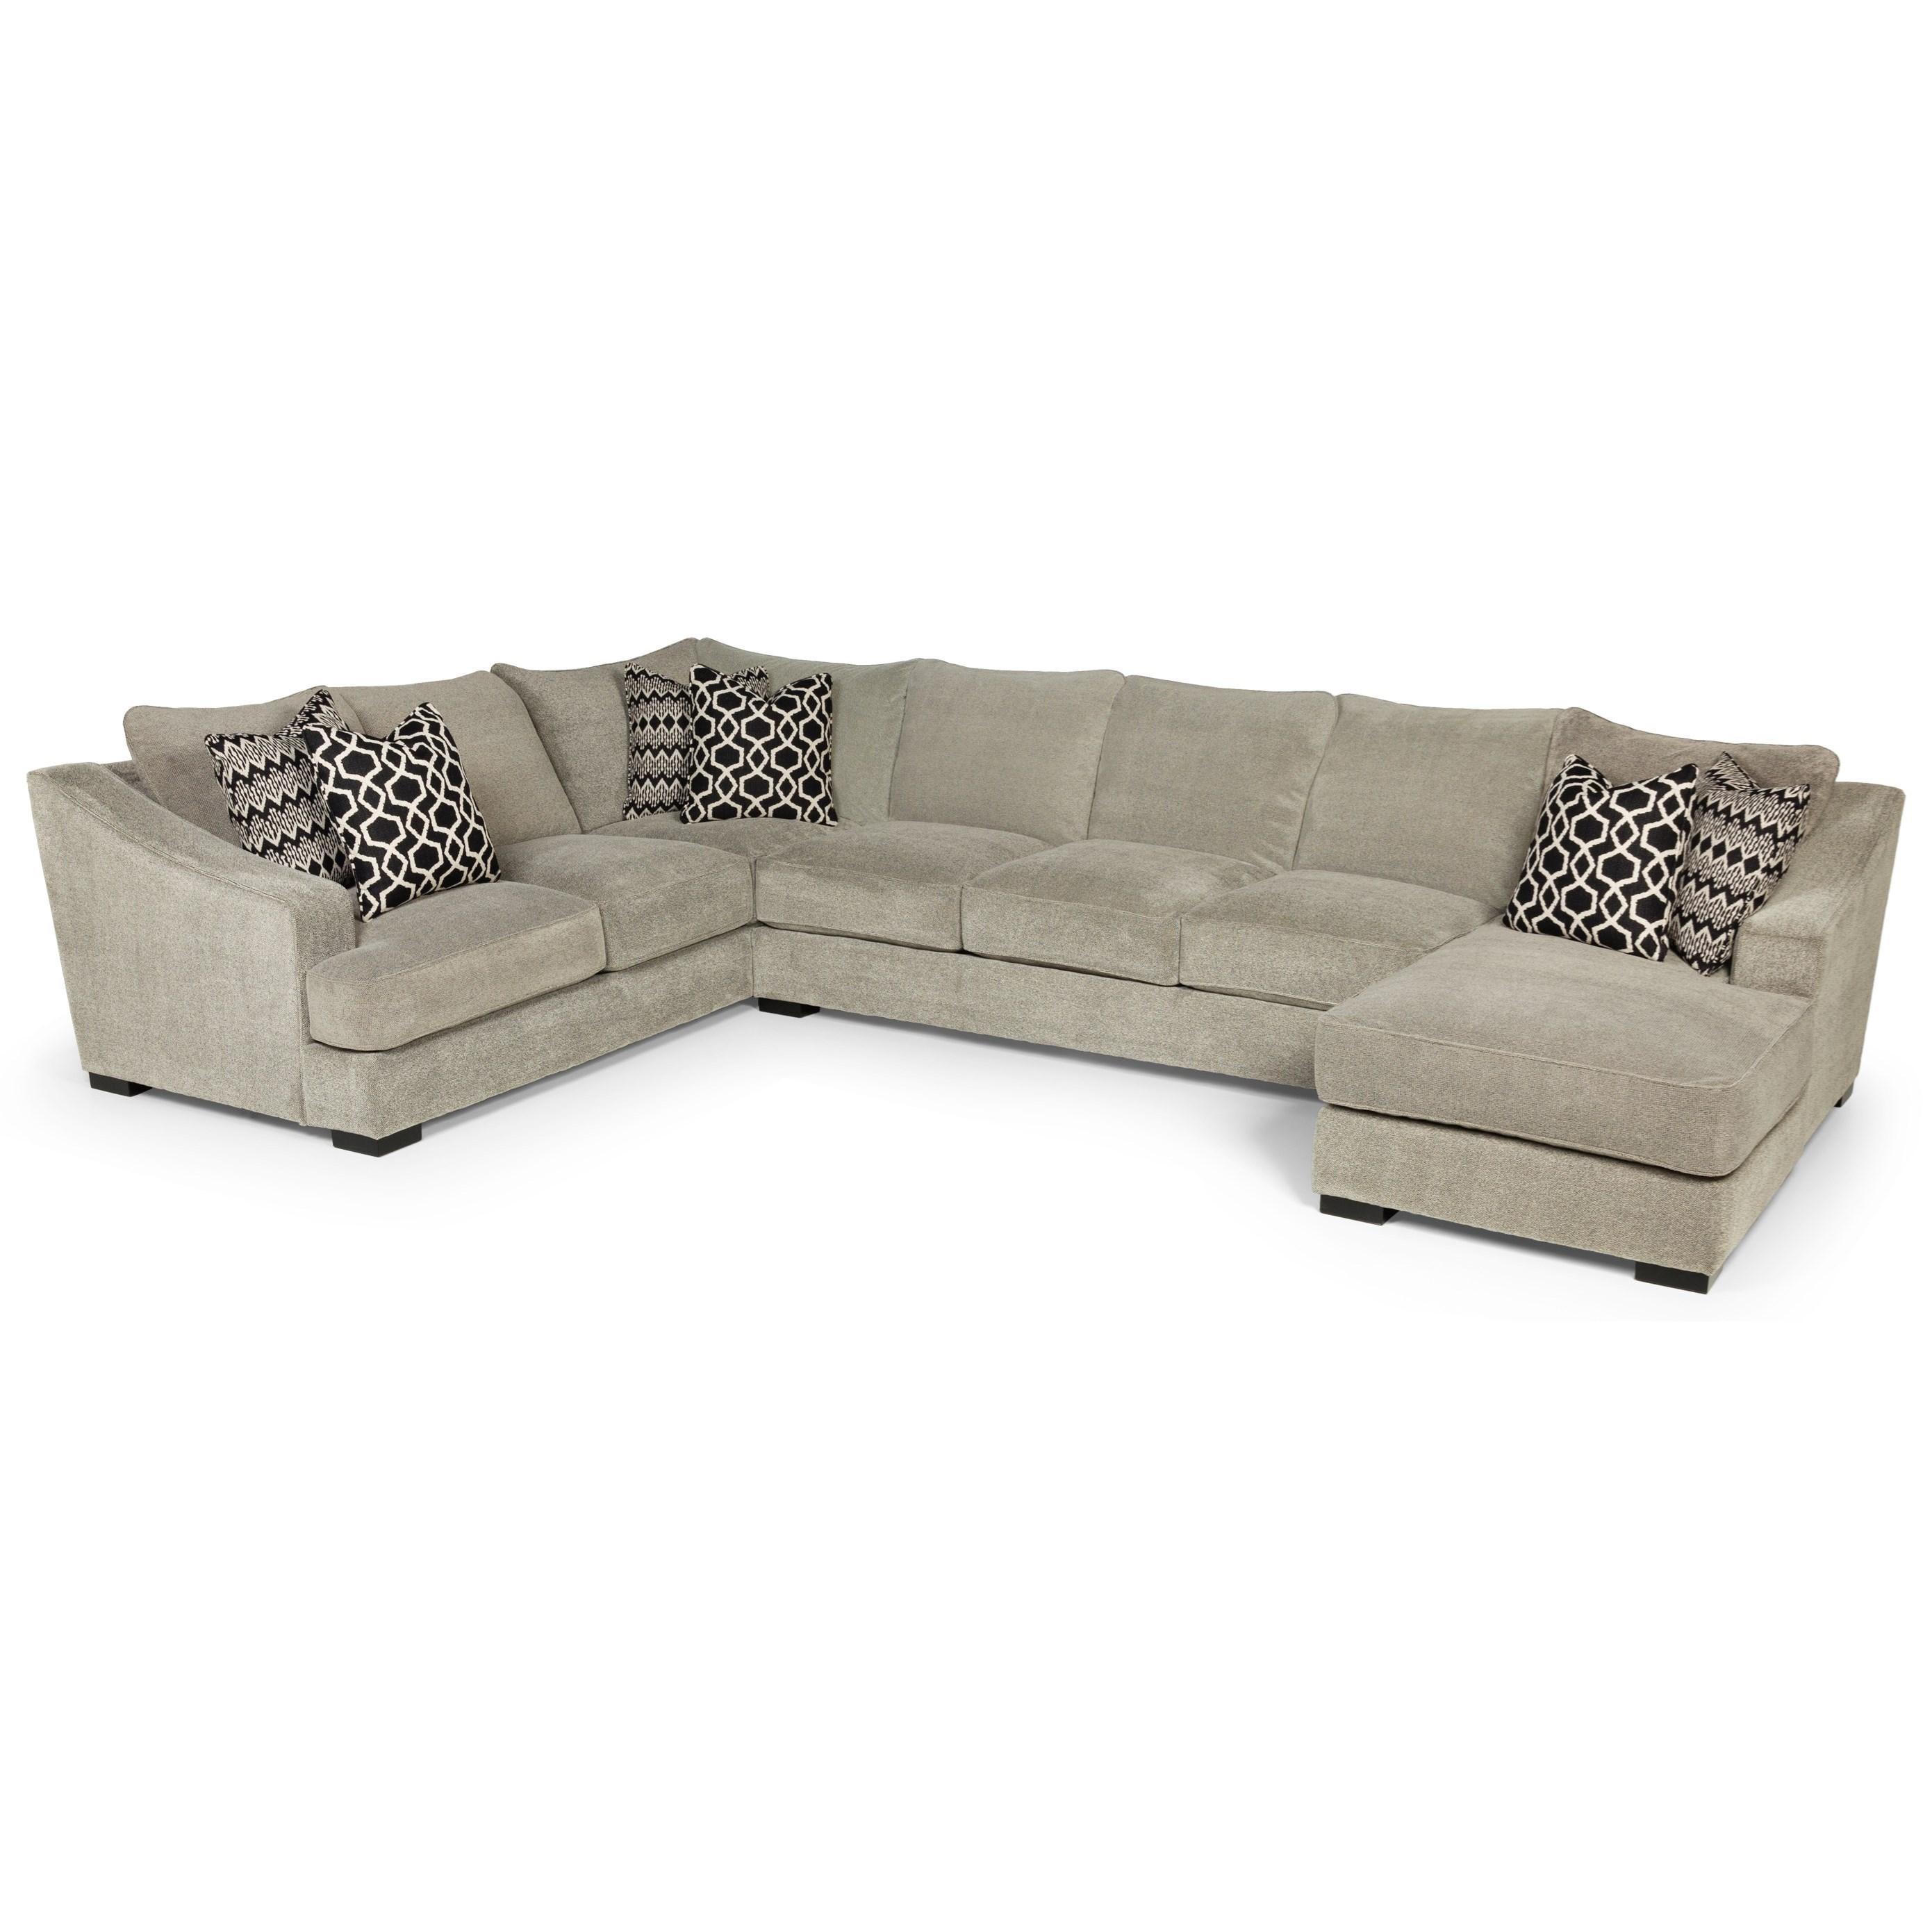 338 3 pc sectional sofa